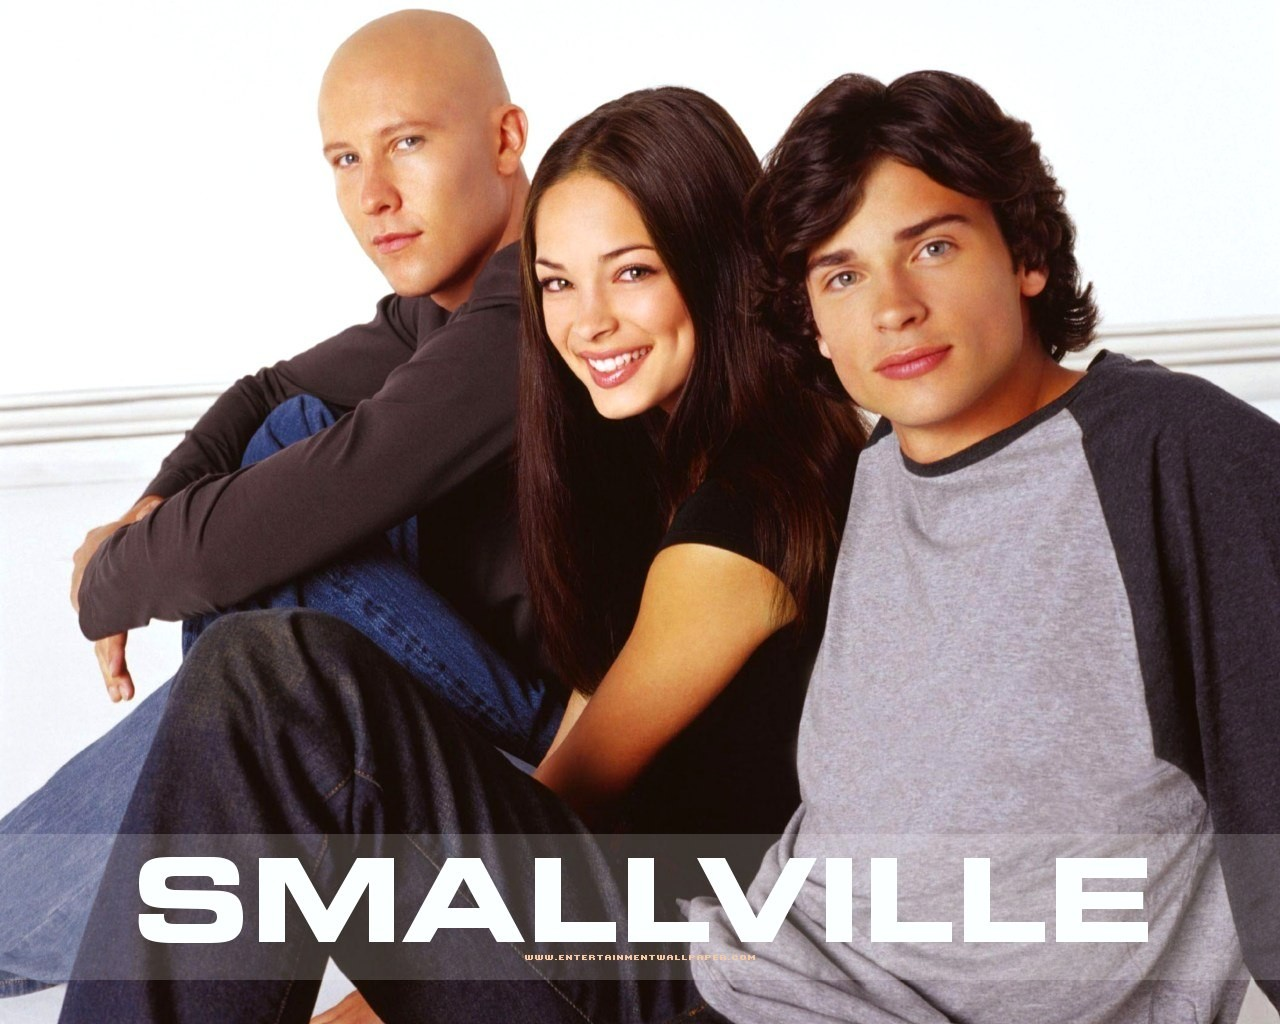 People 1280x1024 Kristin Kreuk Smallville Michael Rosenbaum Tom Welling Lana Lang Lex Luthor Clark Kent